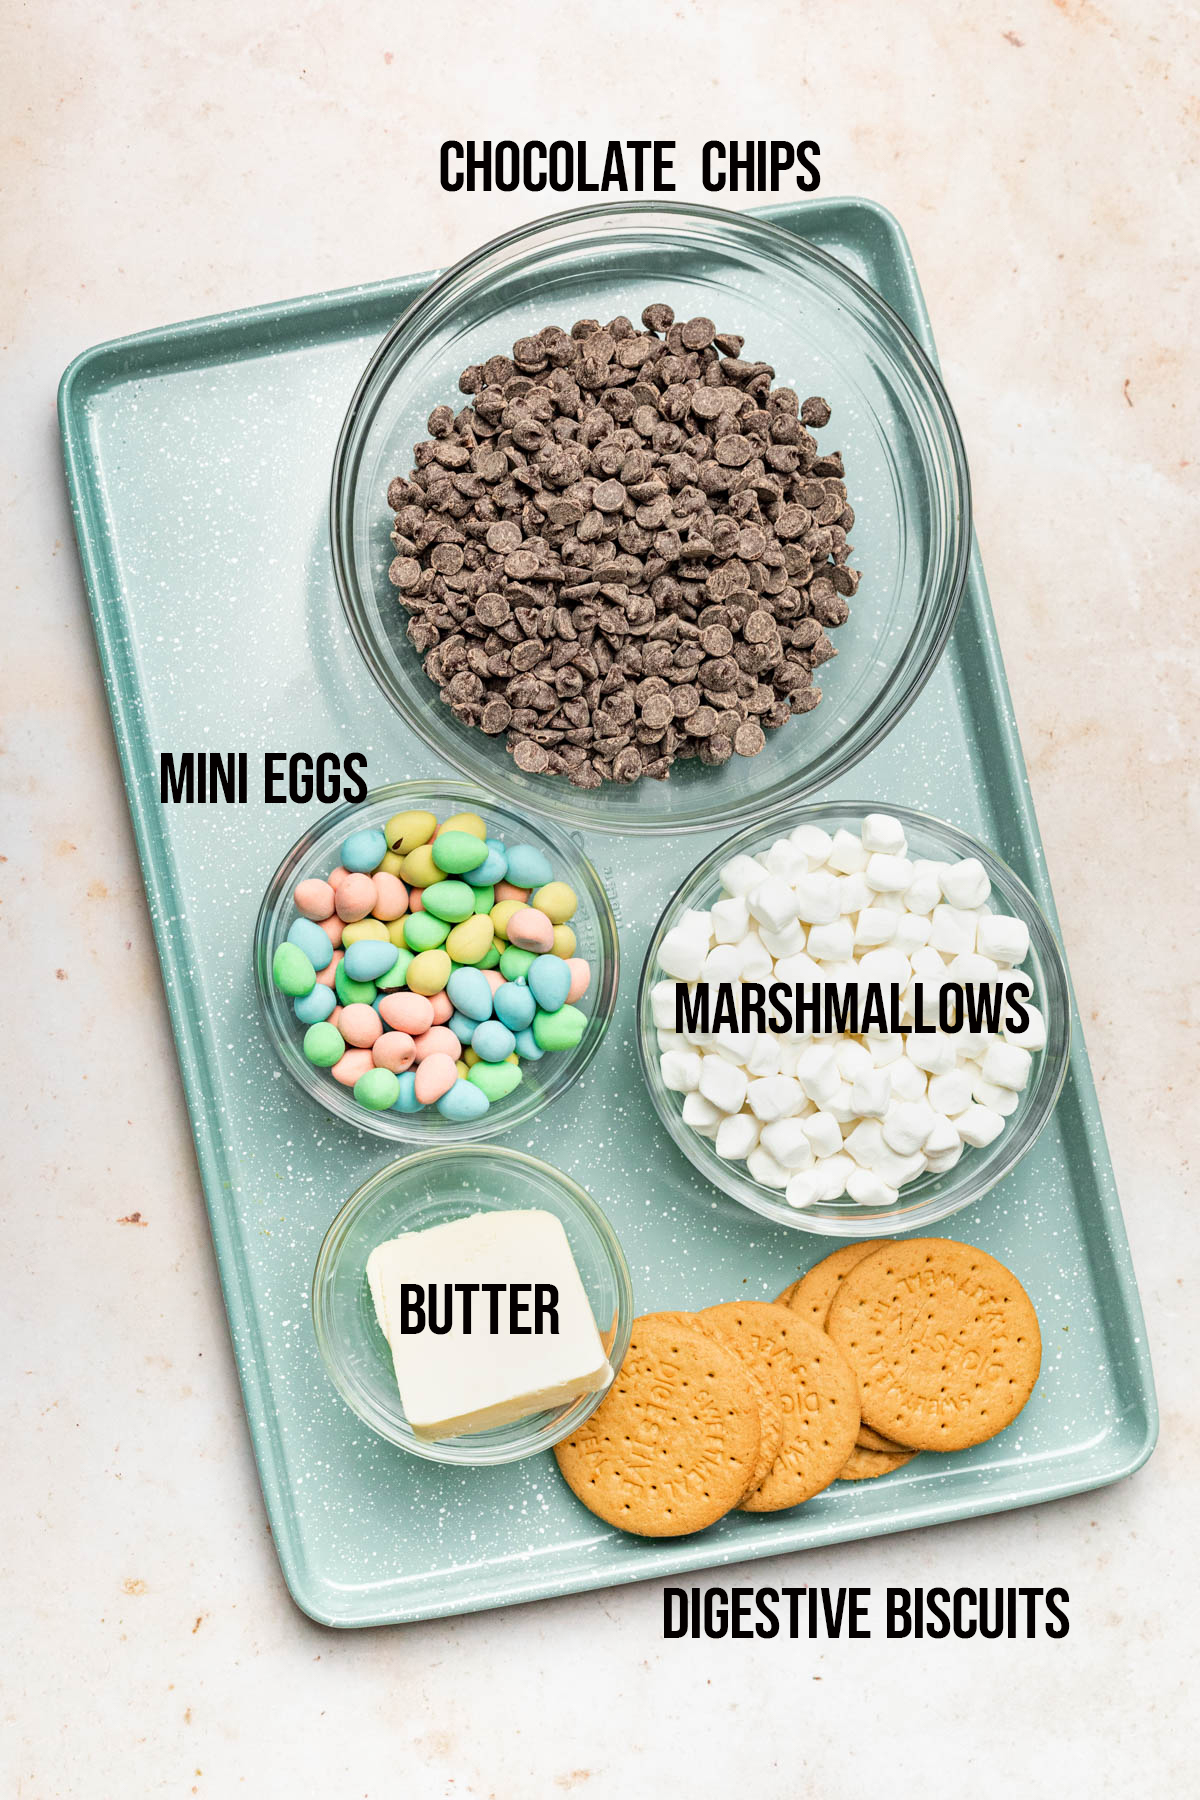 Easter rocky road ingredients.